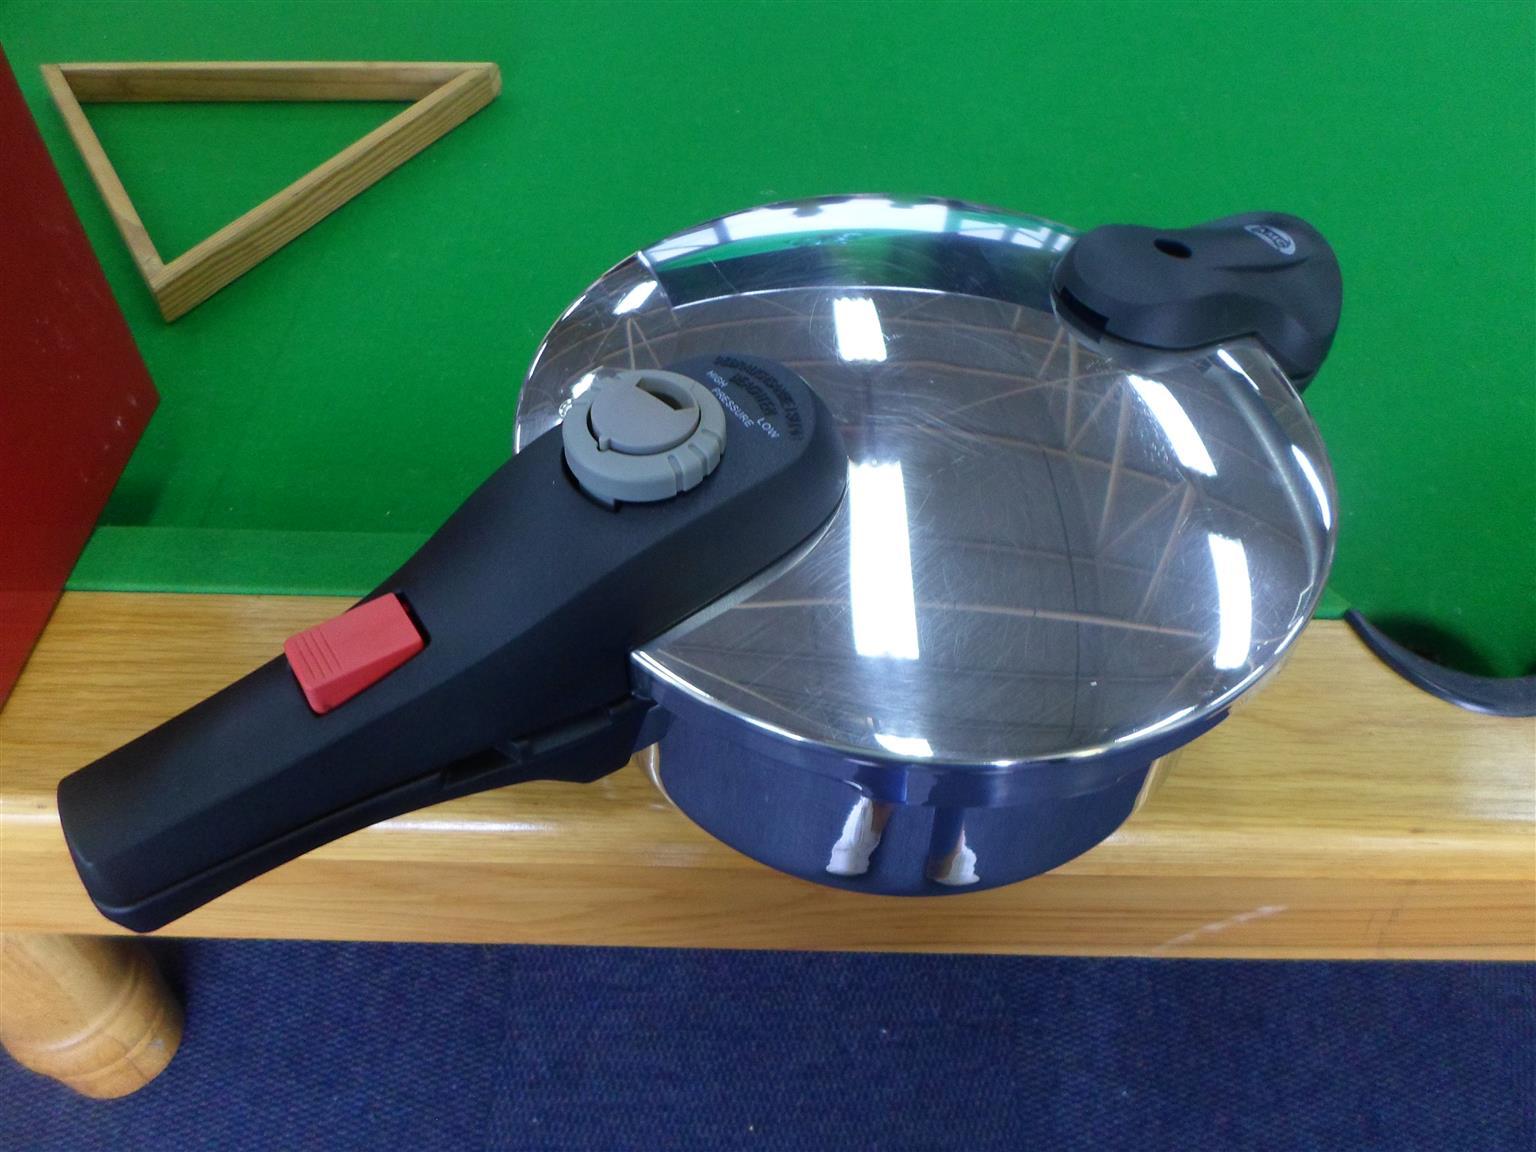 AMC 4l Speedcooker